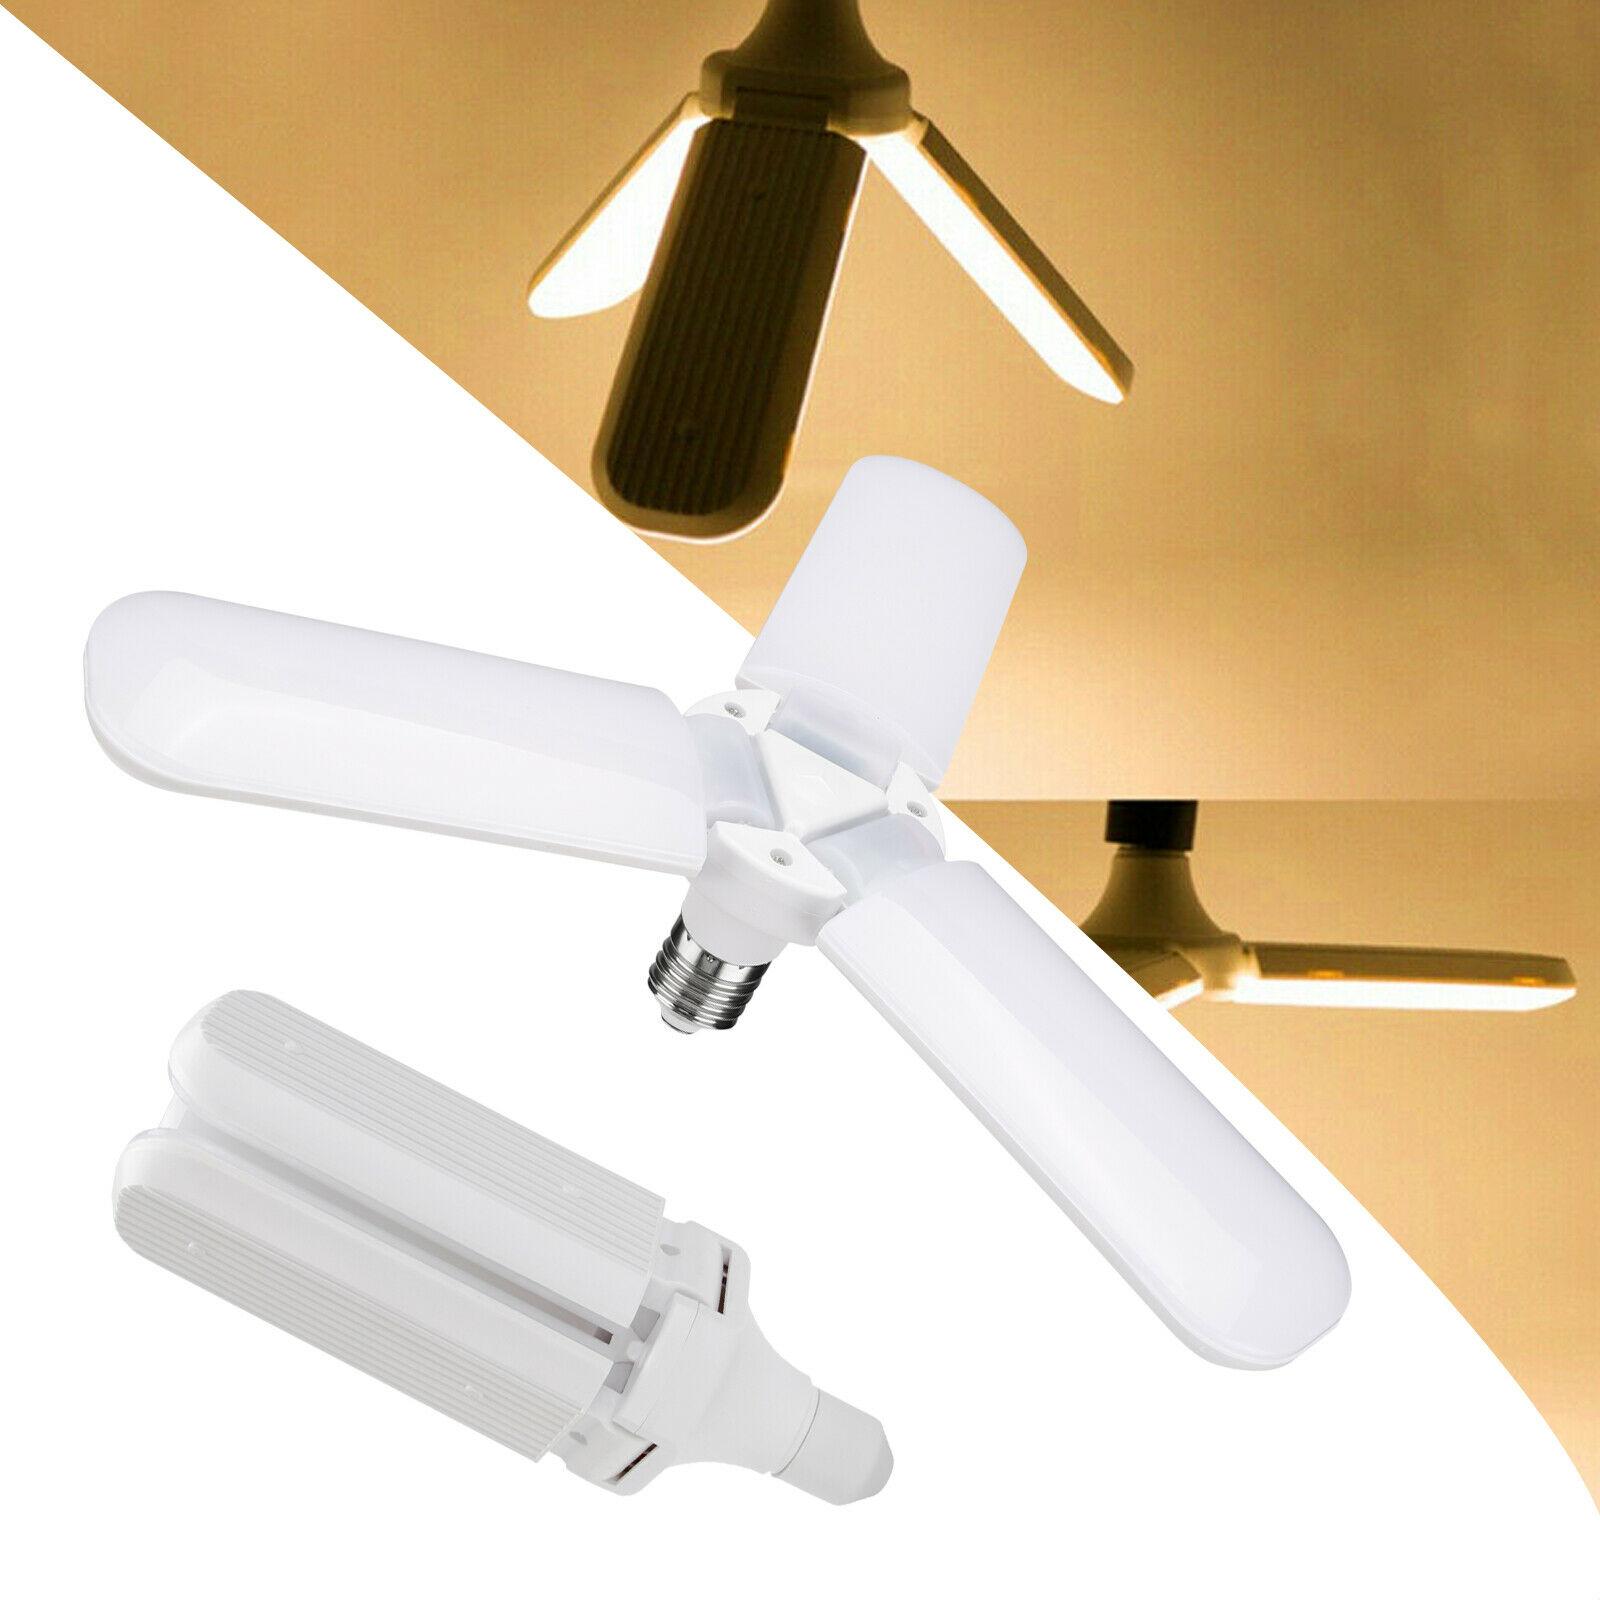 45 W E27 Fan Blade LED Light Bulb LED Lipat Garasi Lampu AC85-265V Disesuaikan Pencahayaan Langit-langit Warm White/Cool putih